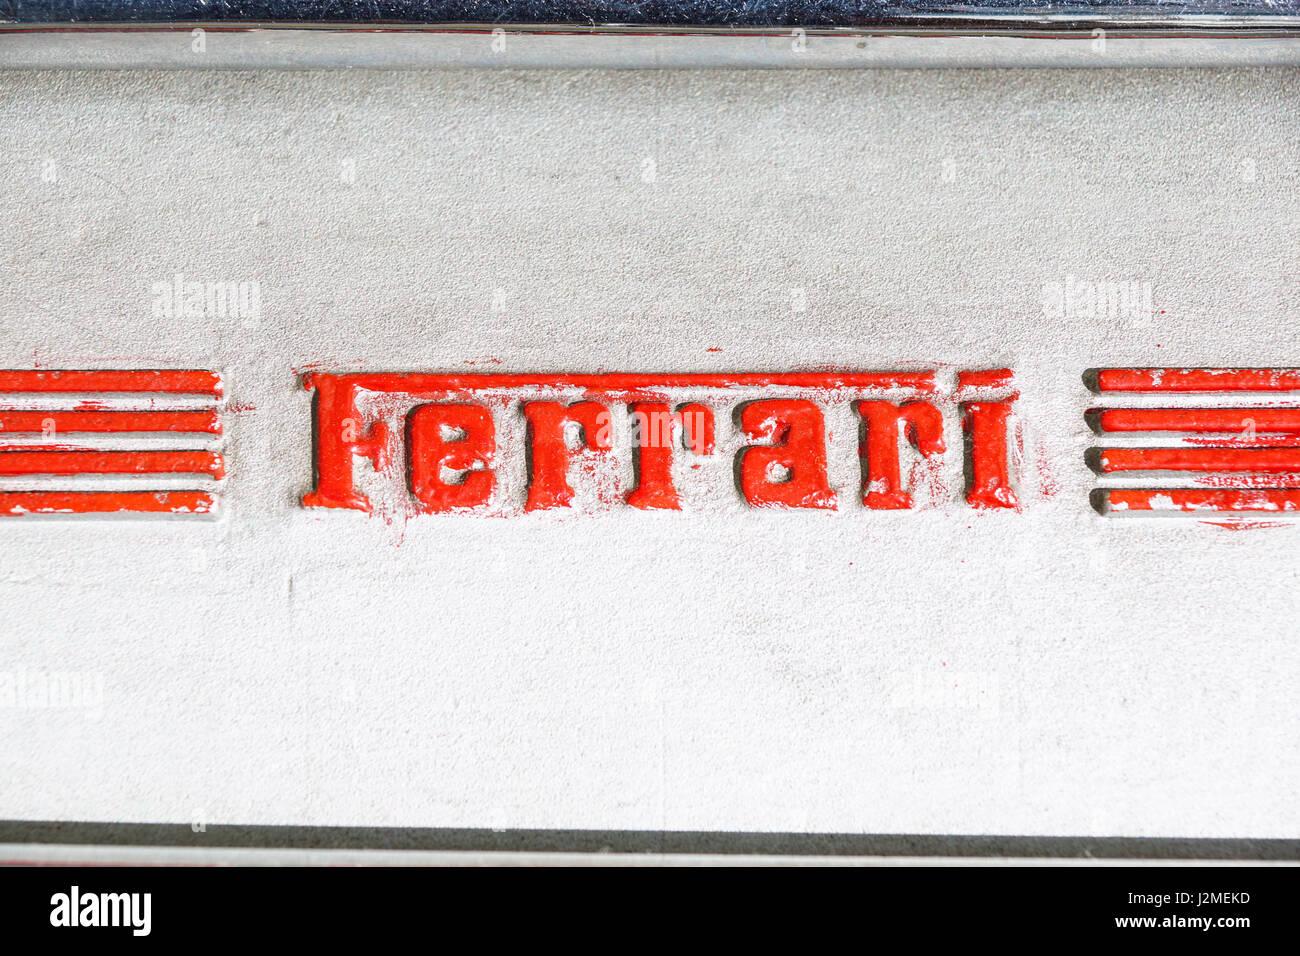 MODENA, ITALY - JULY 09: Logo Ferrari on motor of sport carat Exhibition of Ferrari cars on July 09, 2008 in Modena, - Stock Image